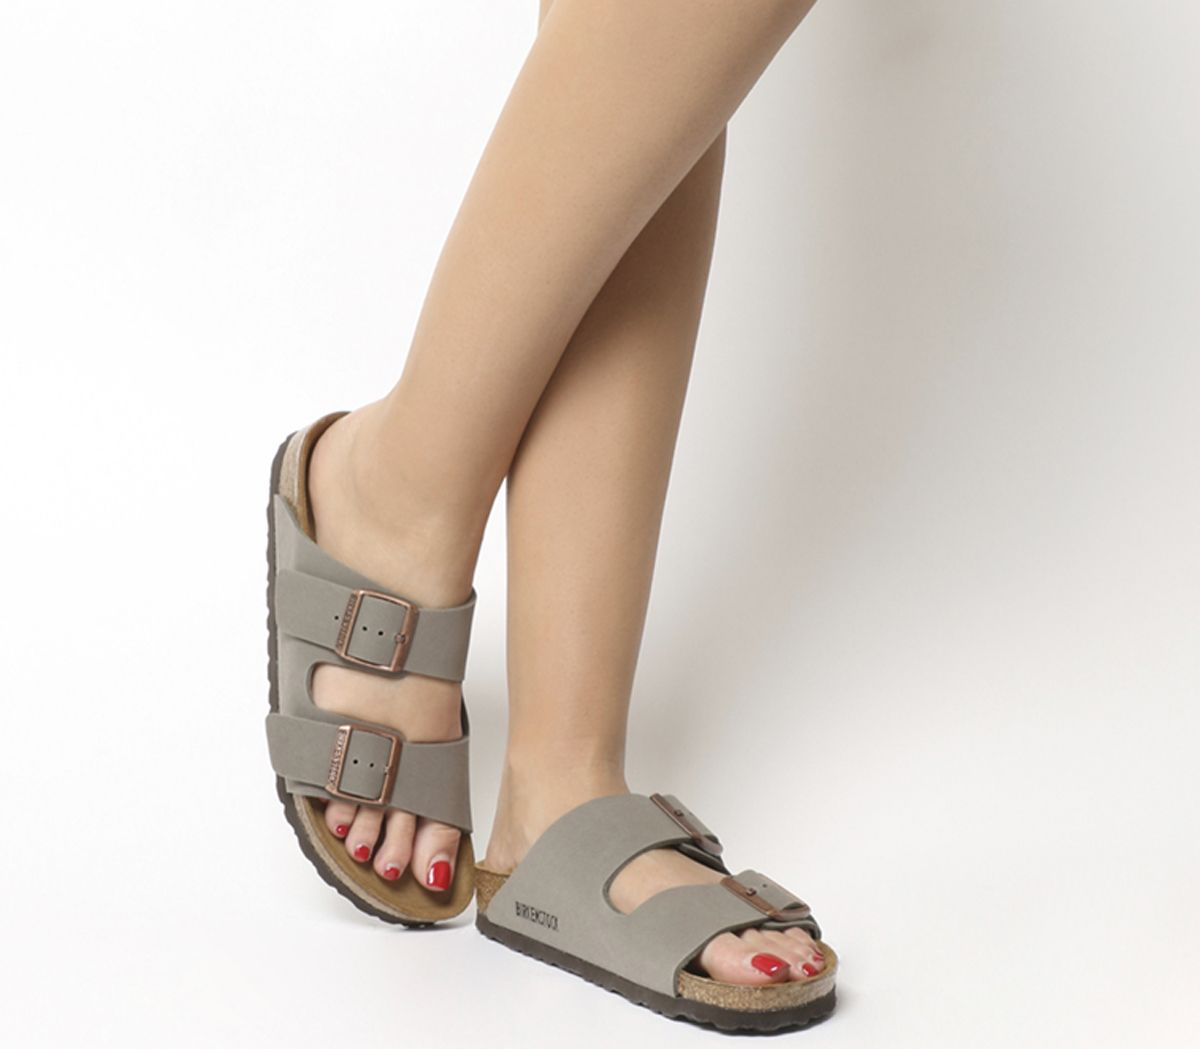 b7ea3ac37 Birkenstock Arizona Two Strap Stone - Sandals